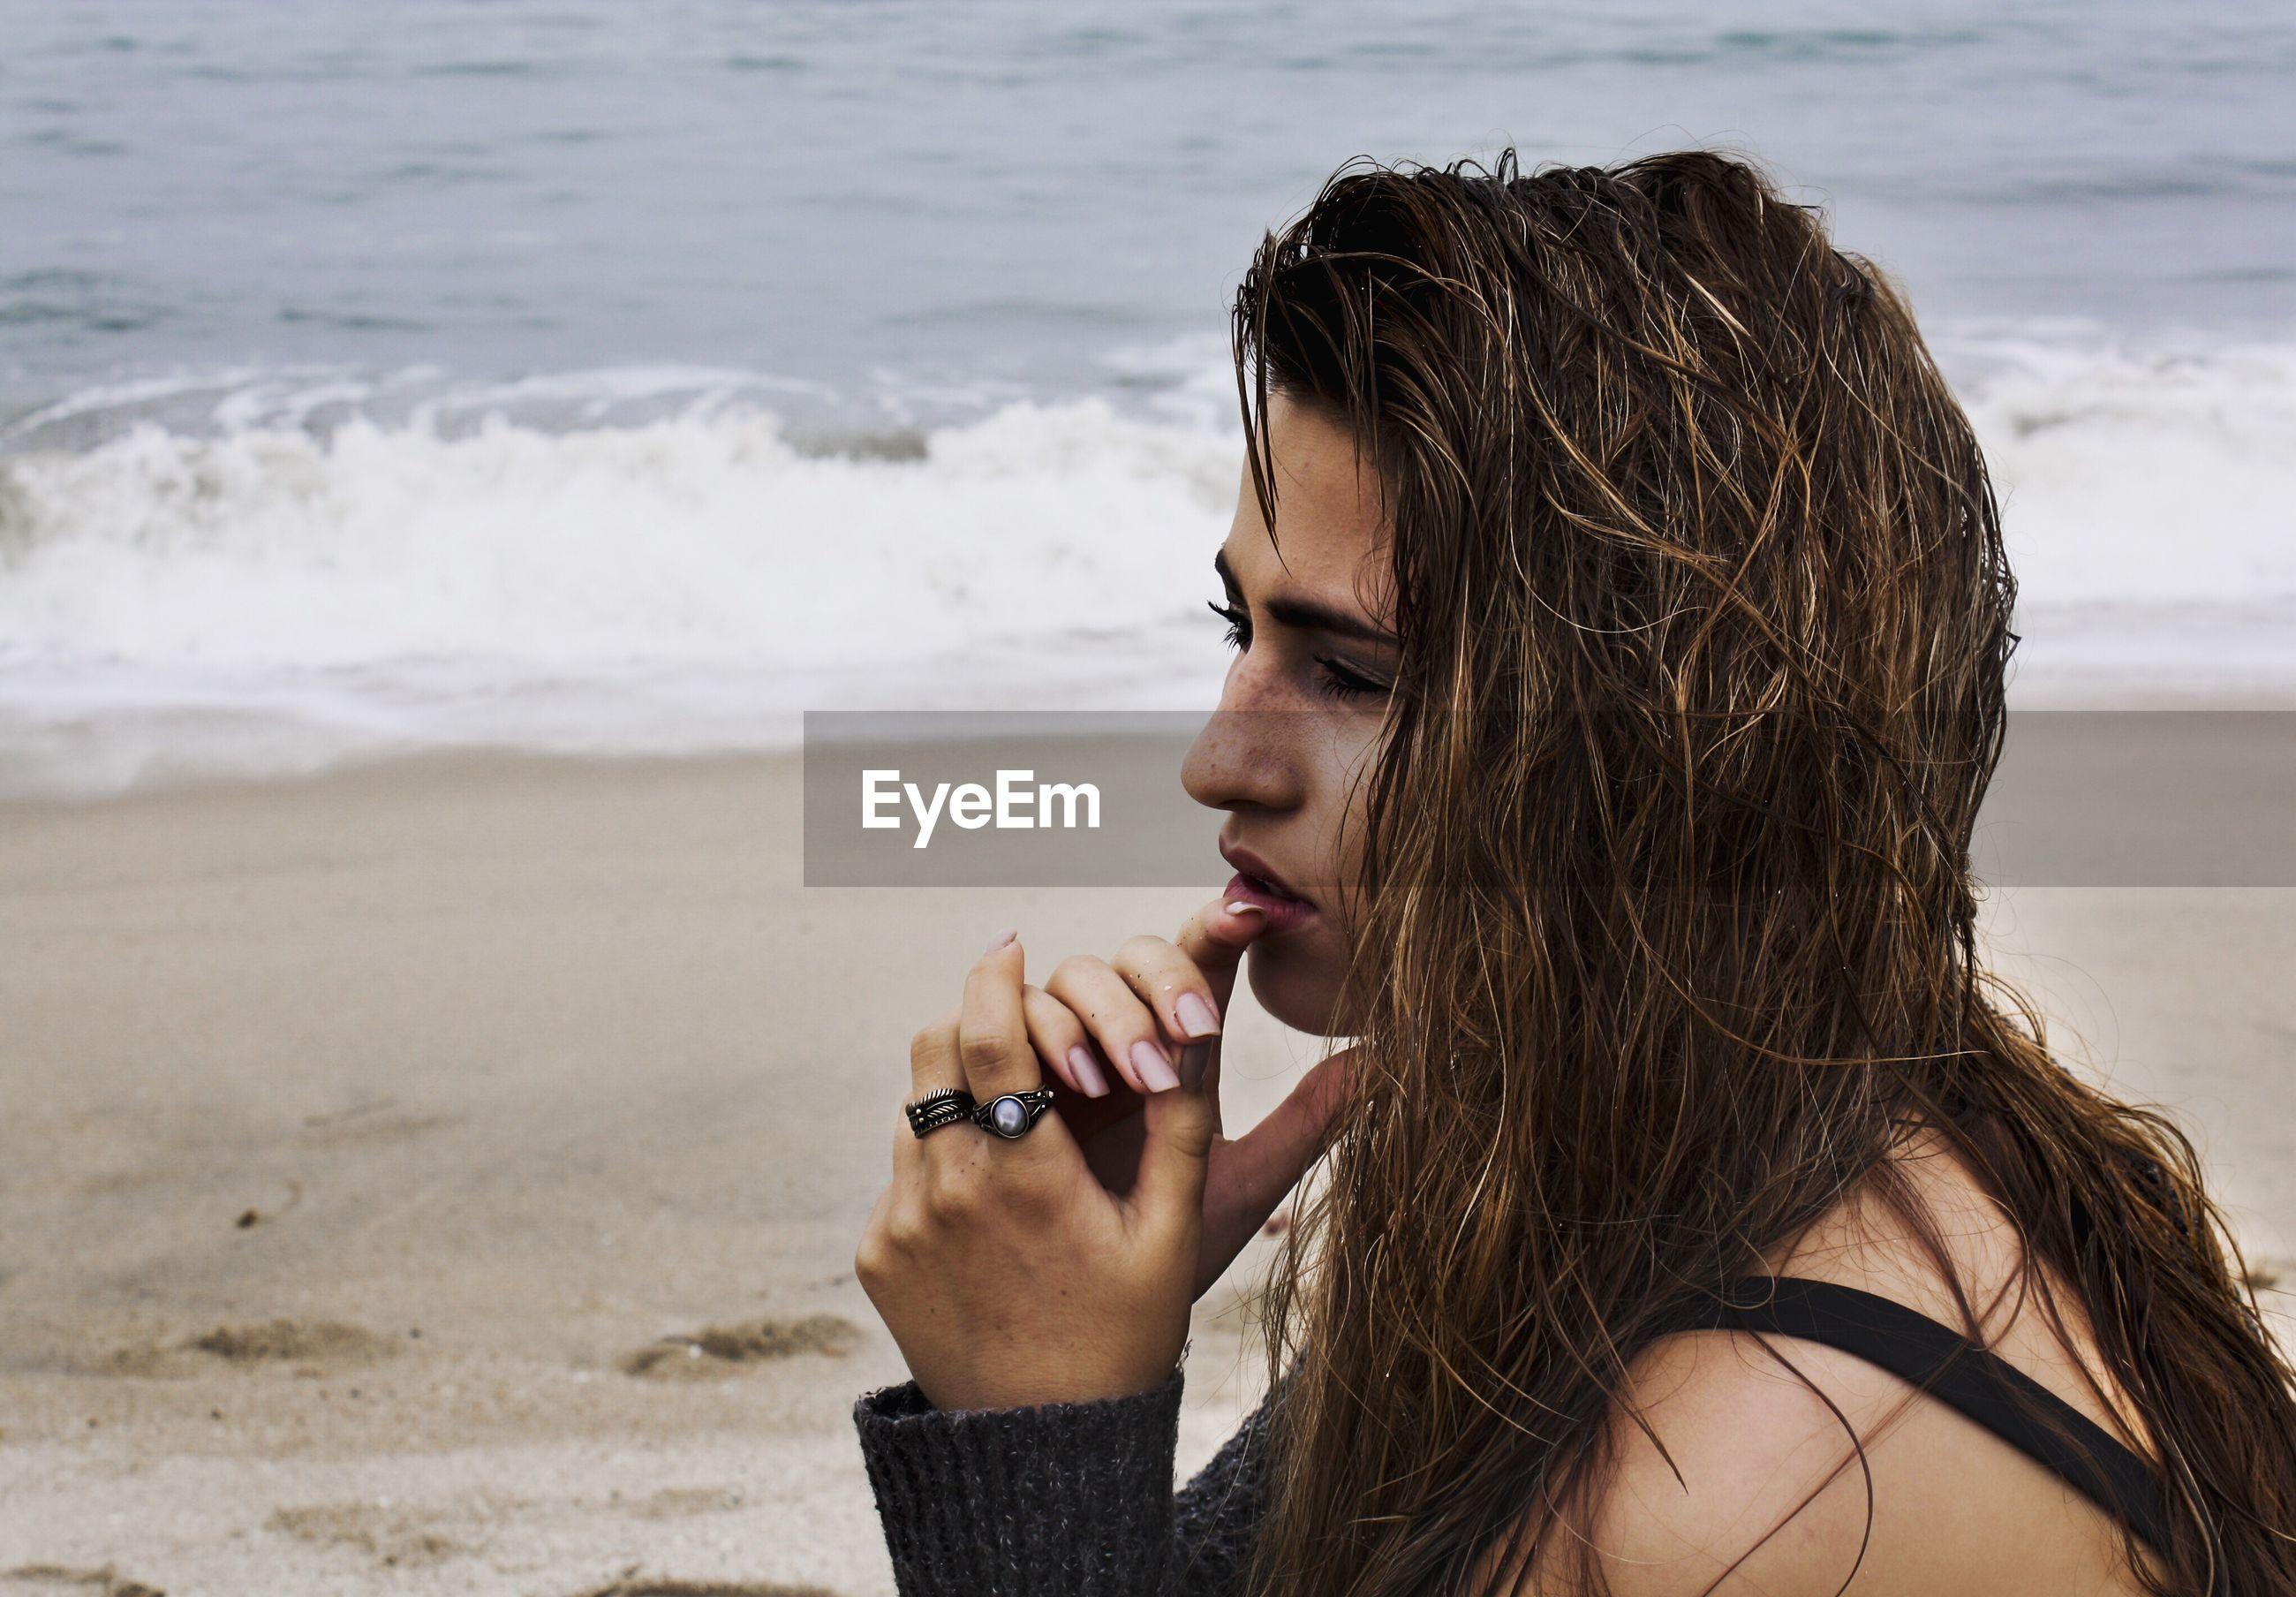 Woman thinking on beach